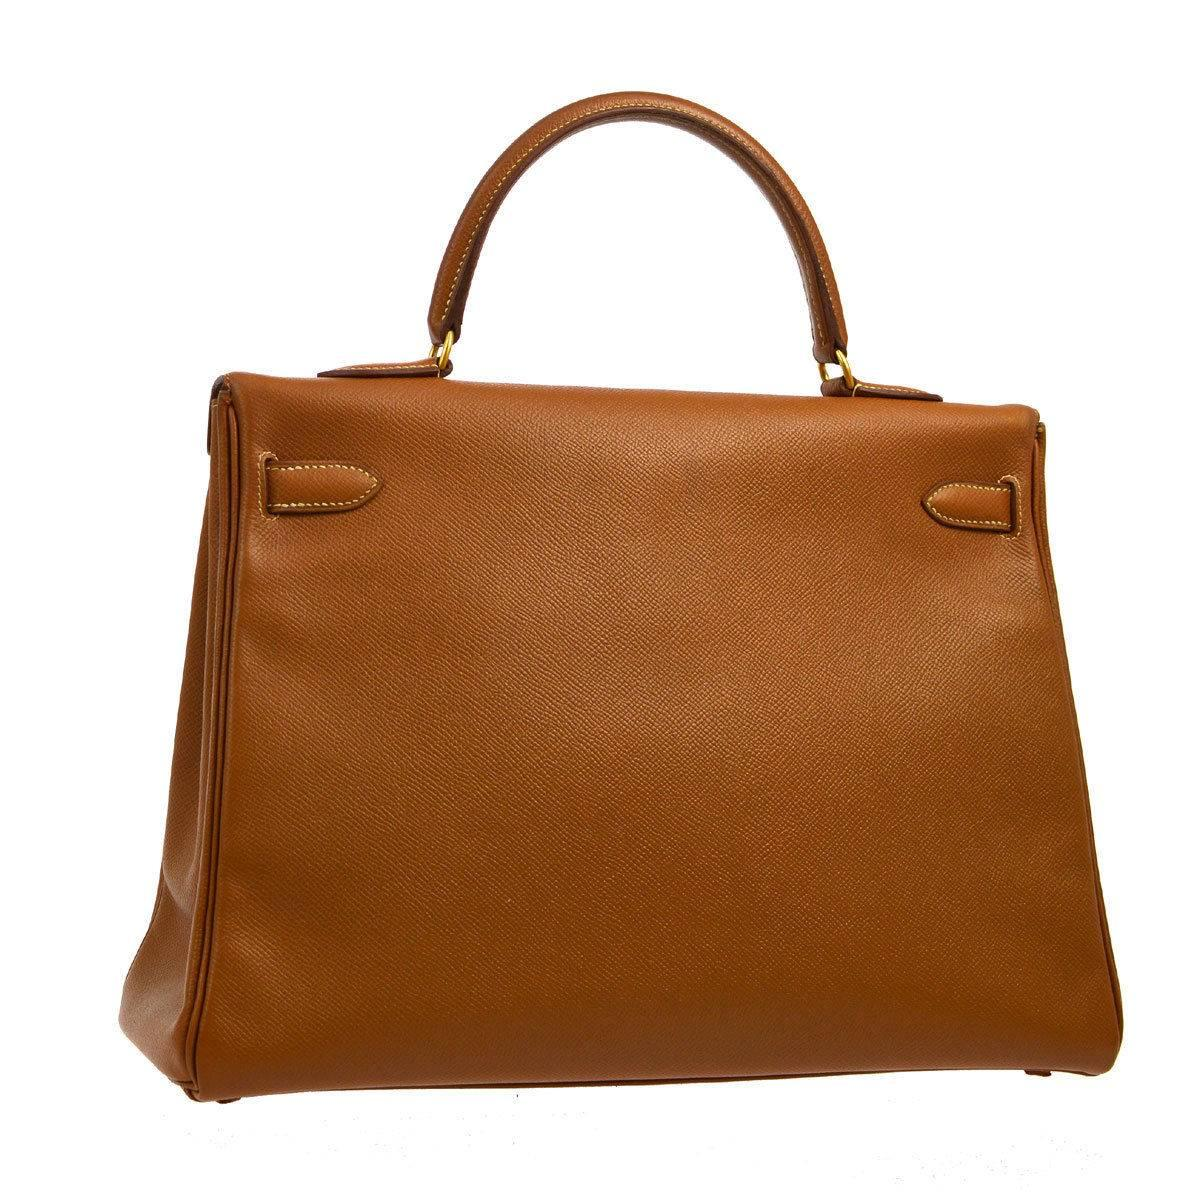 e0adfbbfed3 ... france womens hermes kelly 35 cognac courchevel retourne satchel  shoulder bag for sale adaf1 c3579